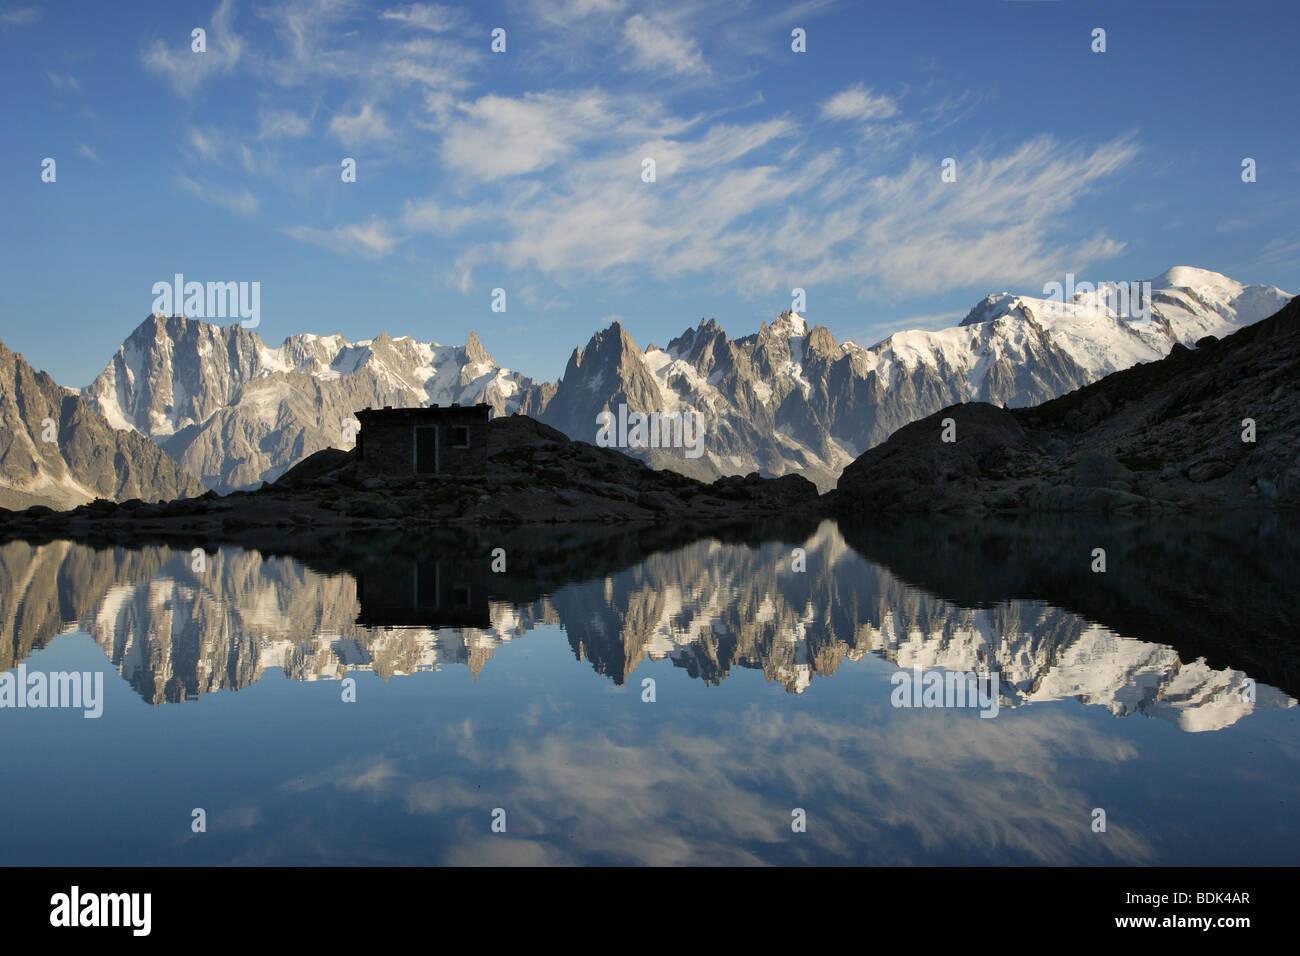 Aiguilles de Chamonix reflecting in Lac Blanc - Stock Image